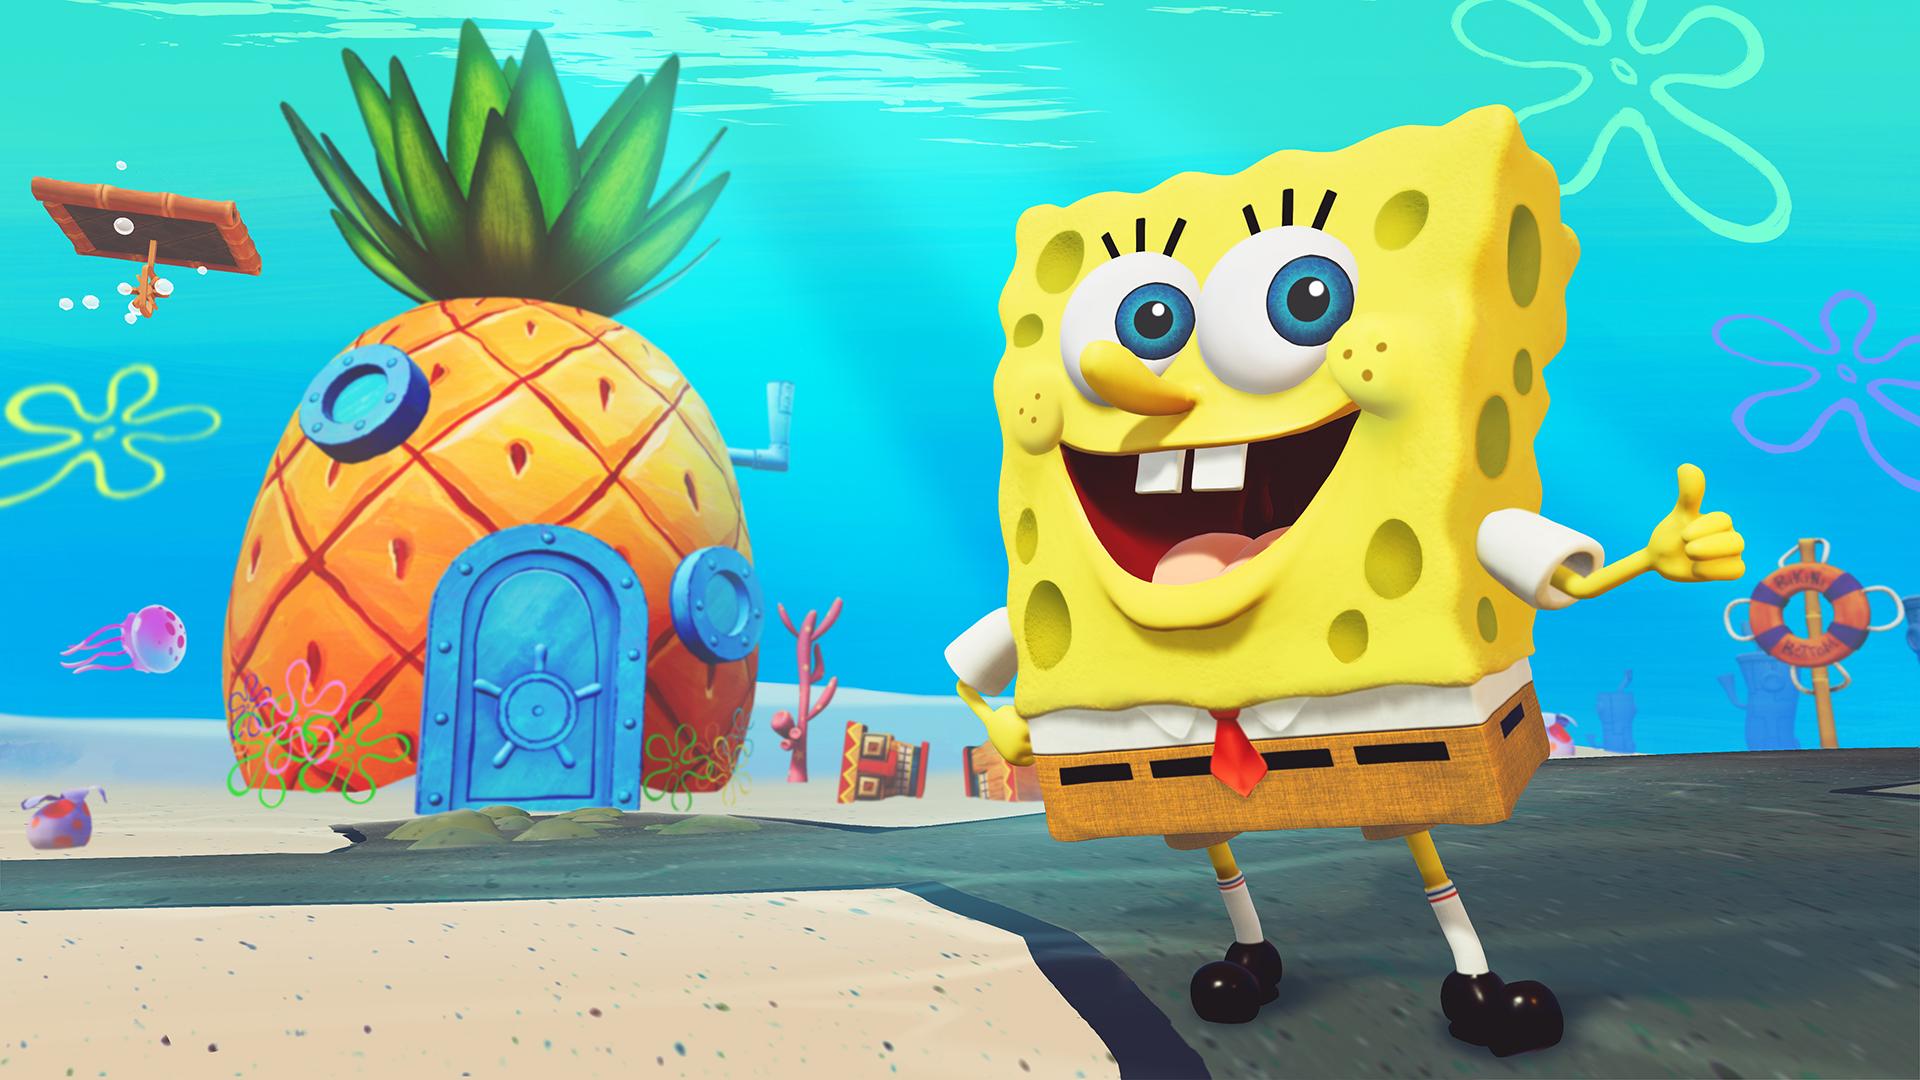 SpongeBob SquarePants 412021 1